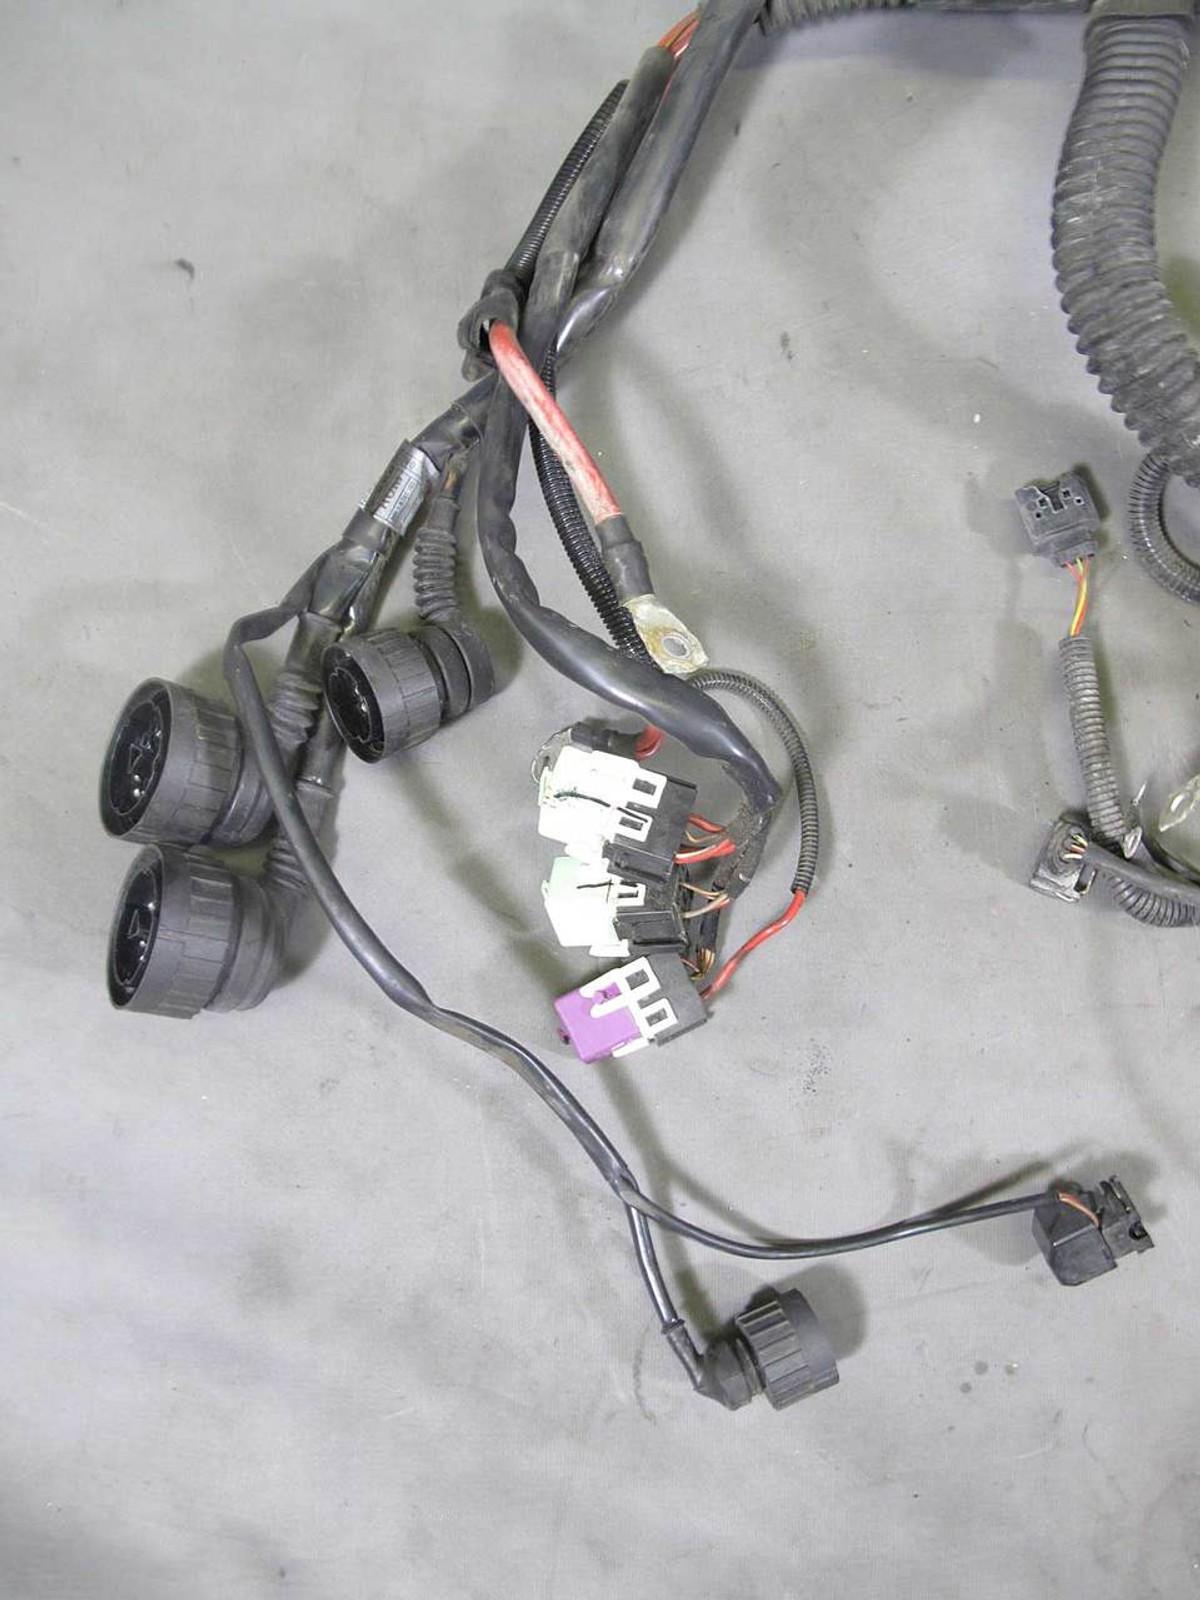 medium resolution of bmw e36 engine wiring harness manual asc t 97 98 99 328i 328is 328ic bmw e36 m50 engine wiring harness bmw e36 engine wiring harness